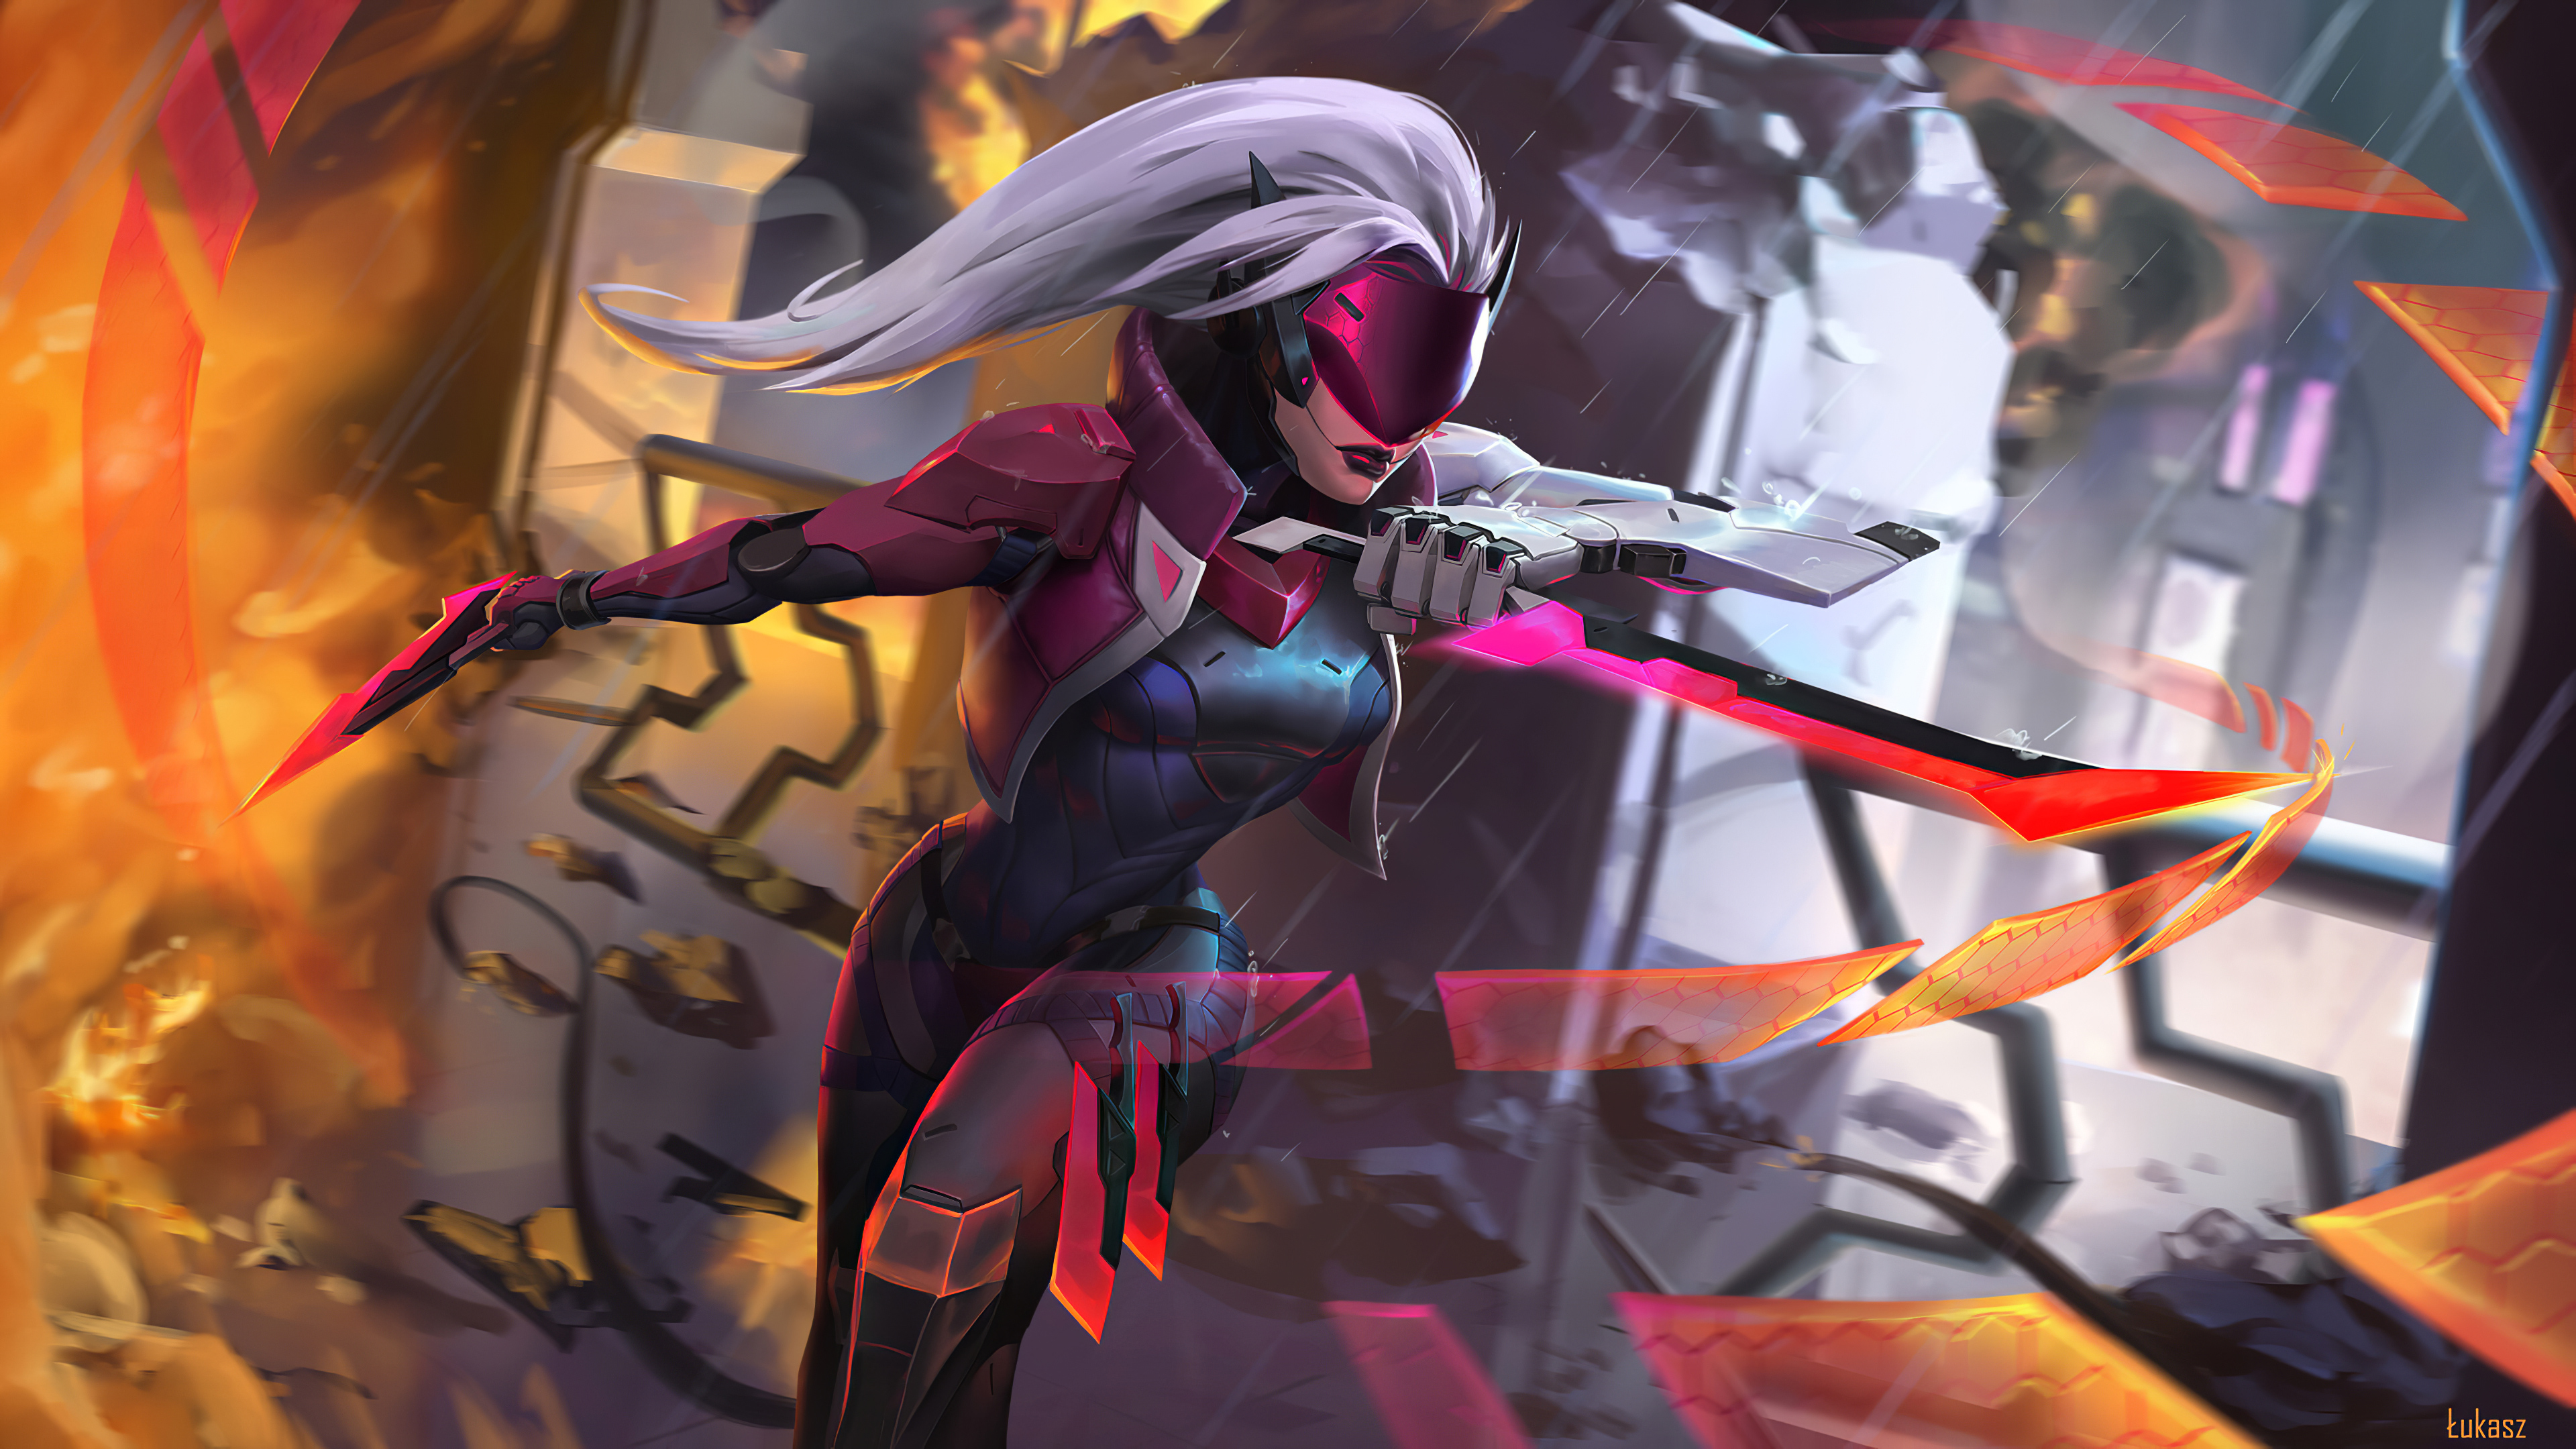 Katarina League Of Legends Woman Warrior White Hair 3840x2160